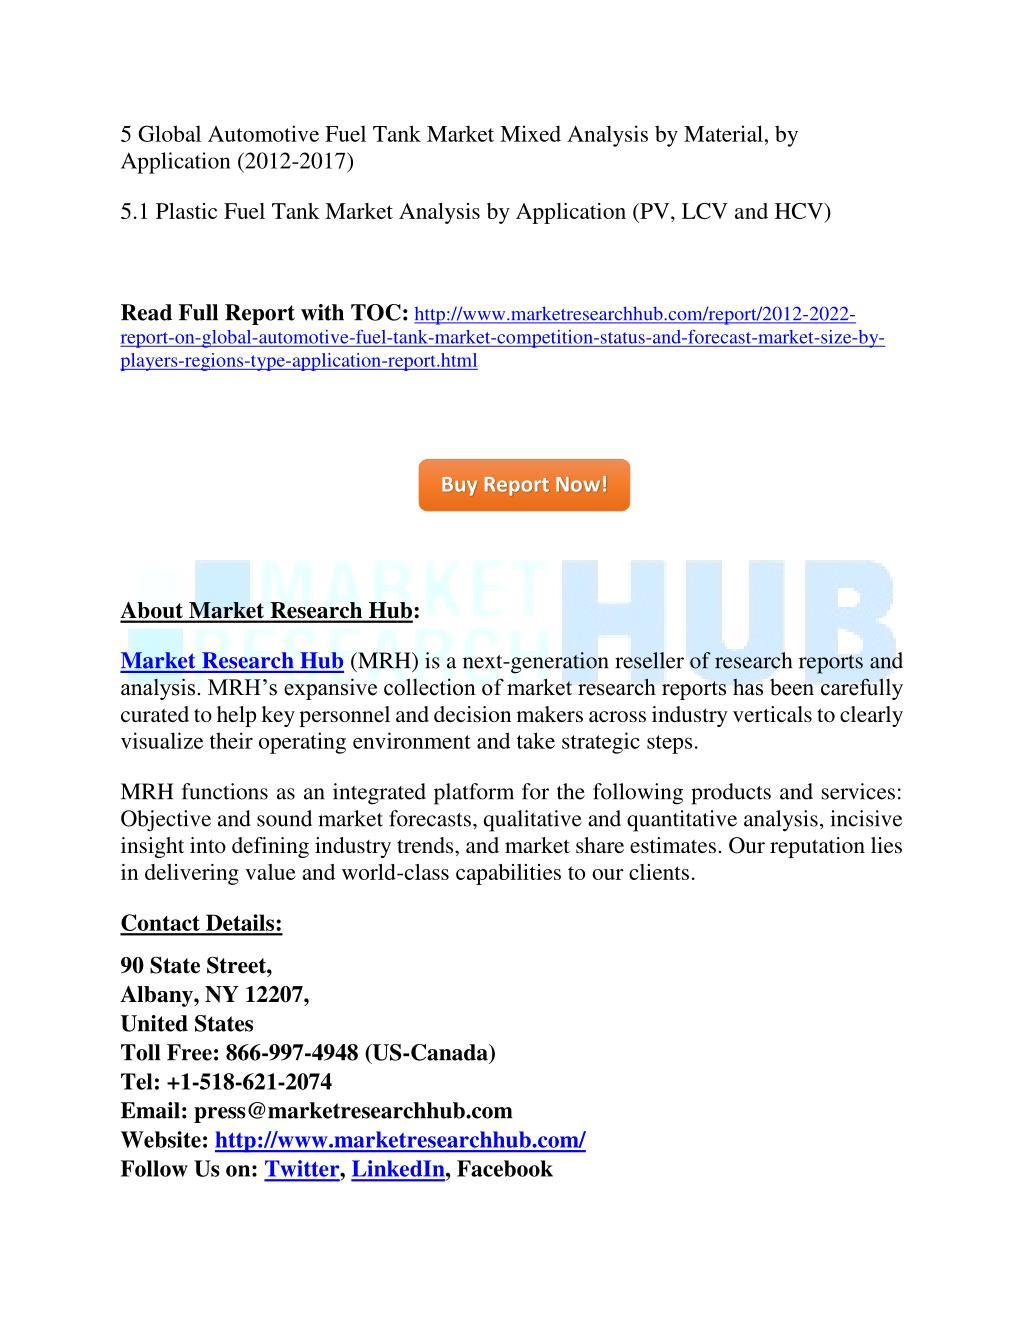 PPT - Global Automotive Fuel Tank Market Competition, Status